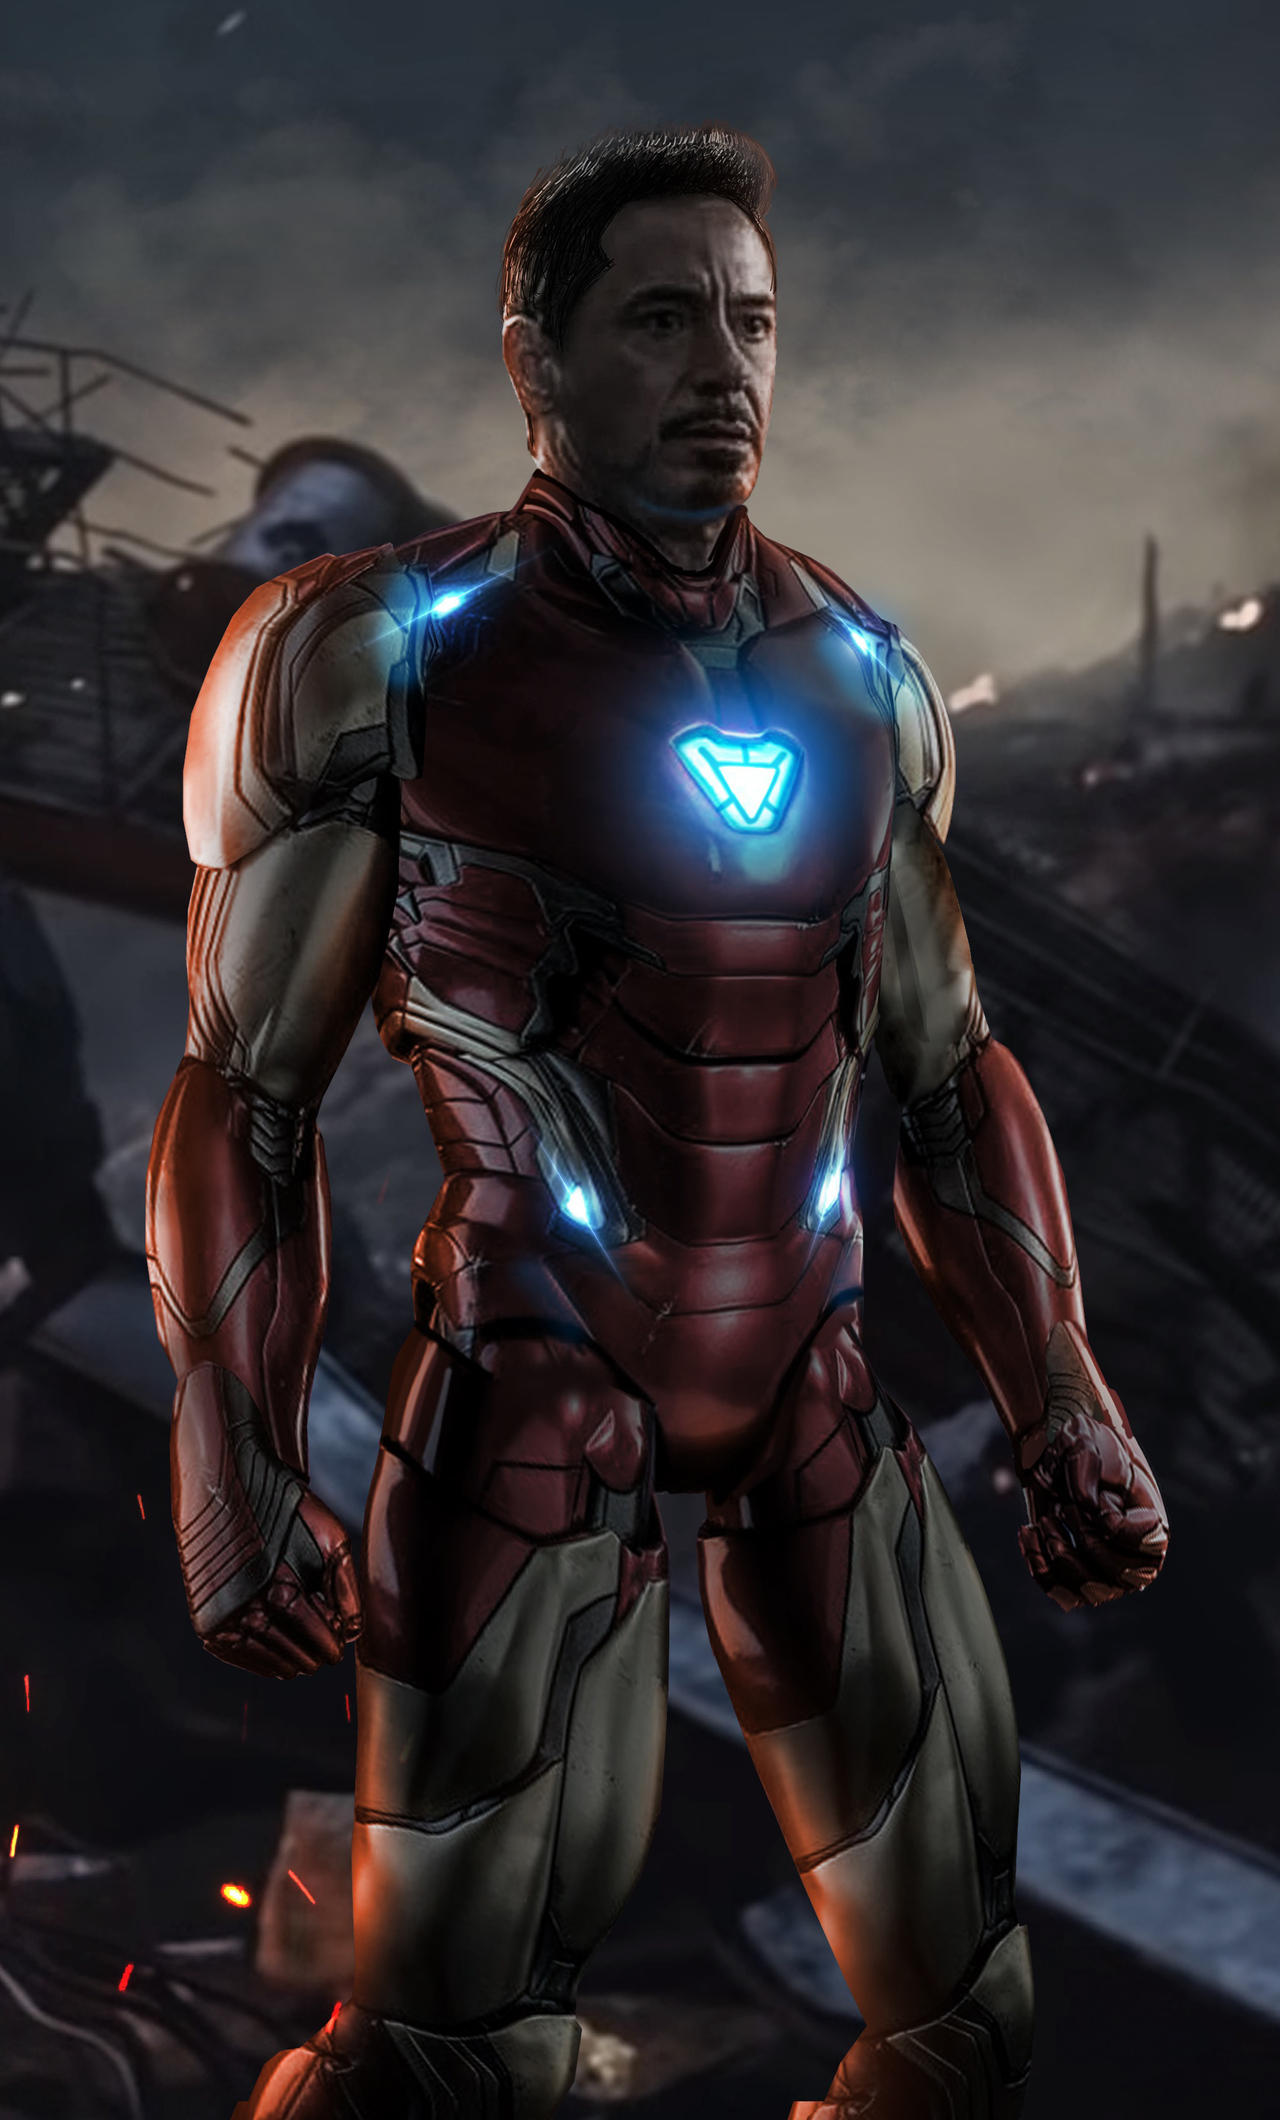 1280x2120 Iron Man Avengers Endgame iPhone 6+ HD 4k ...